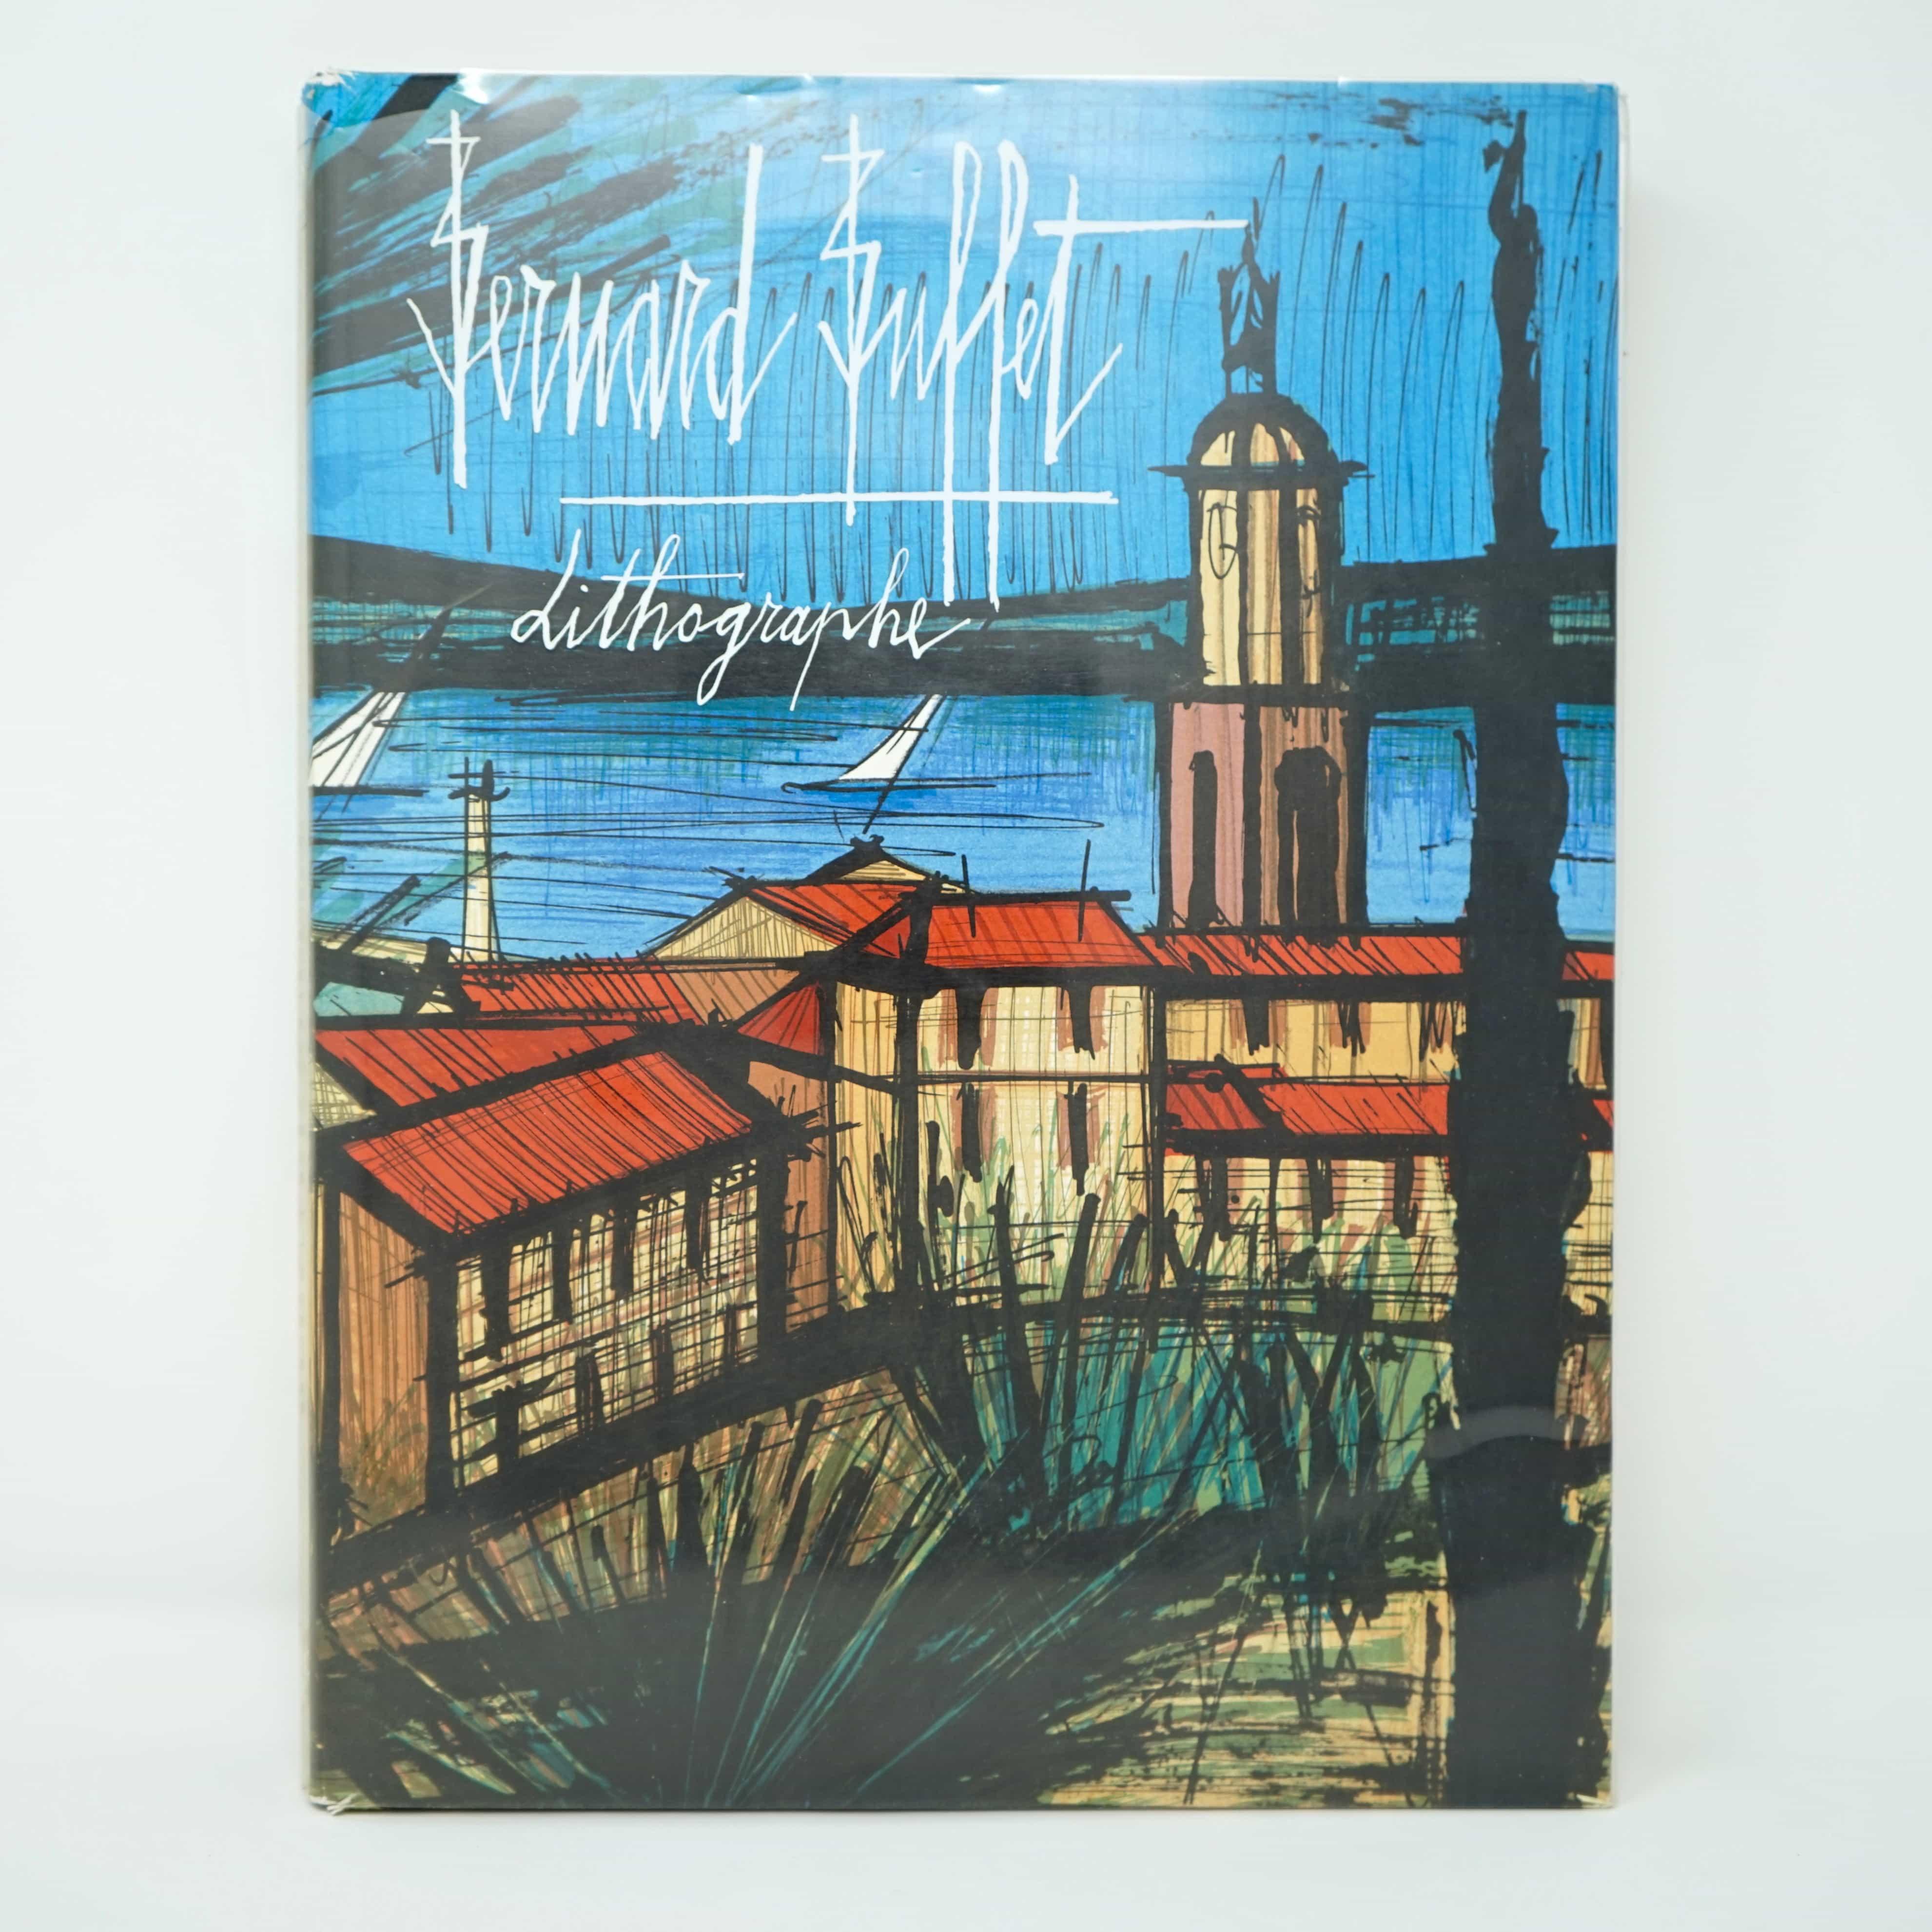 Livre d'Art Bernard Buffet Lithographe Par Charles Sorlier Couverture